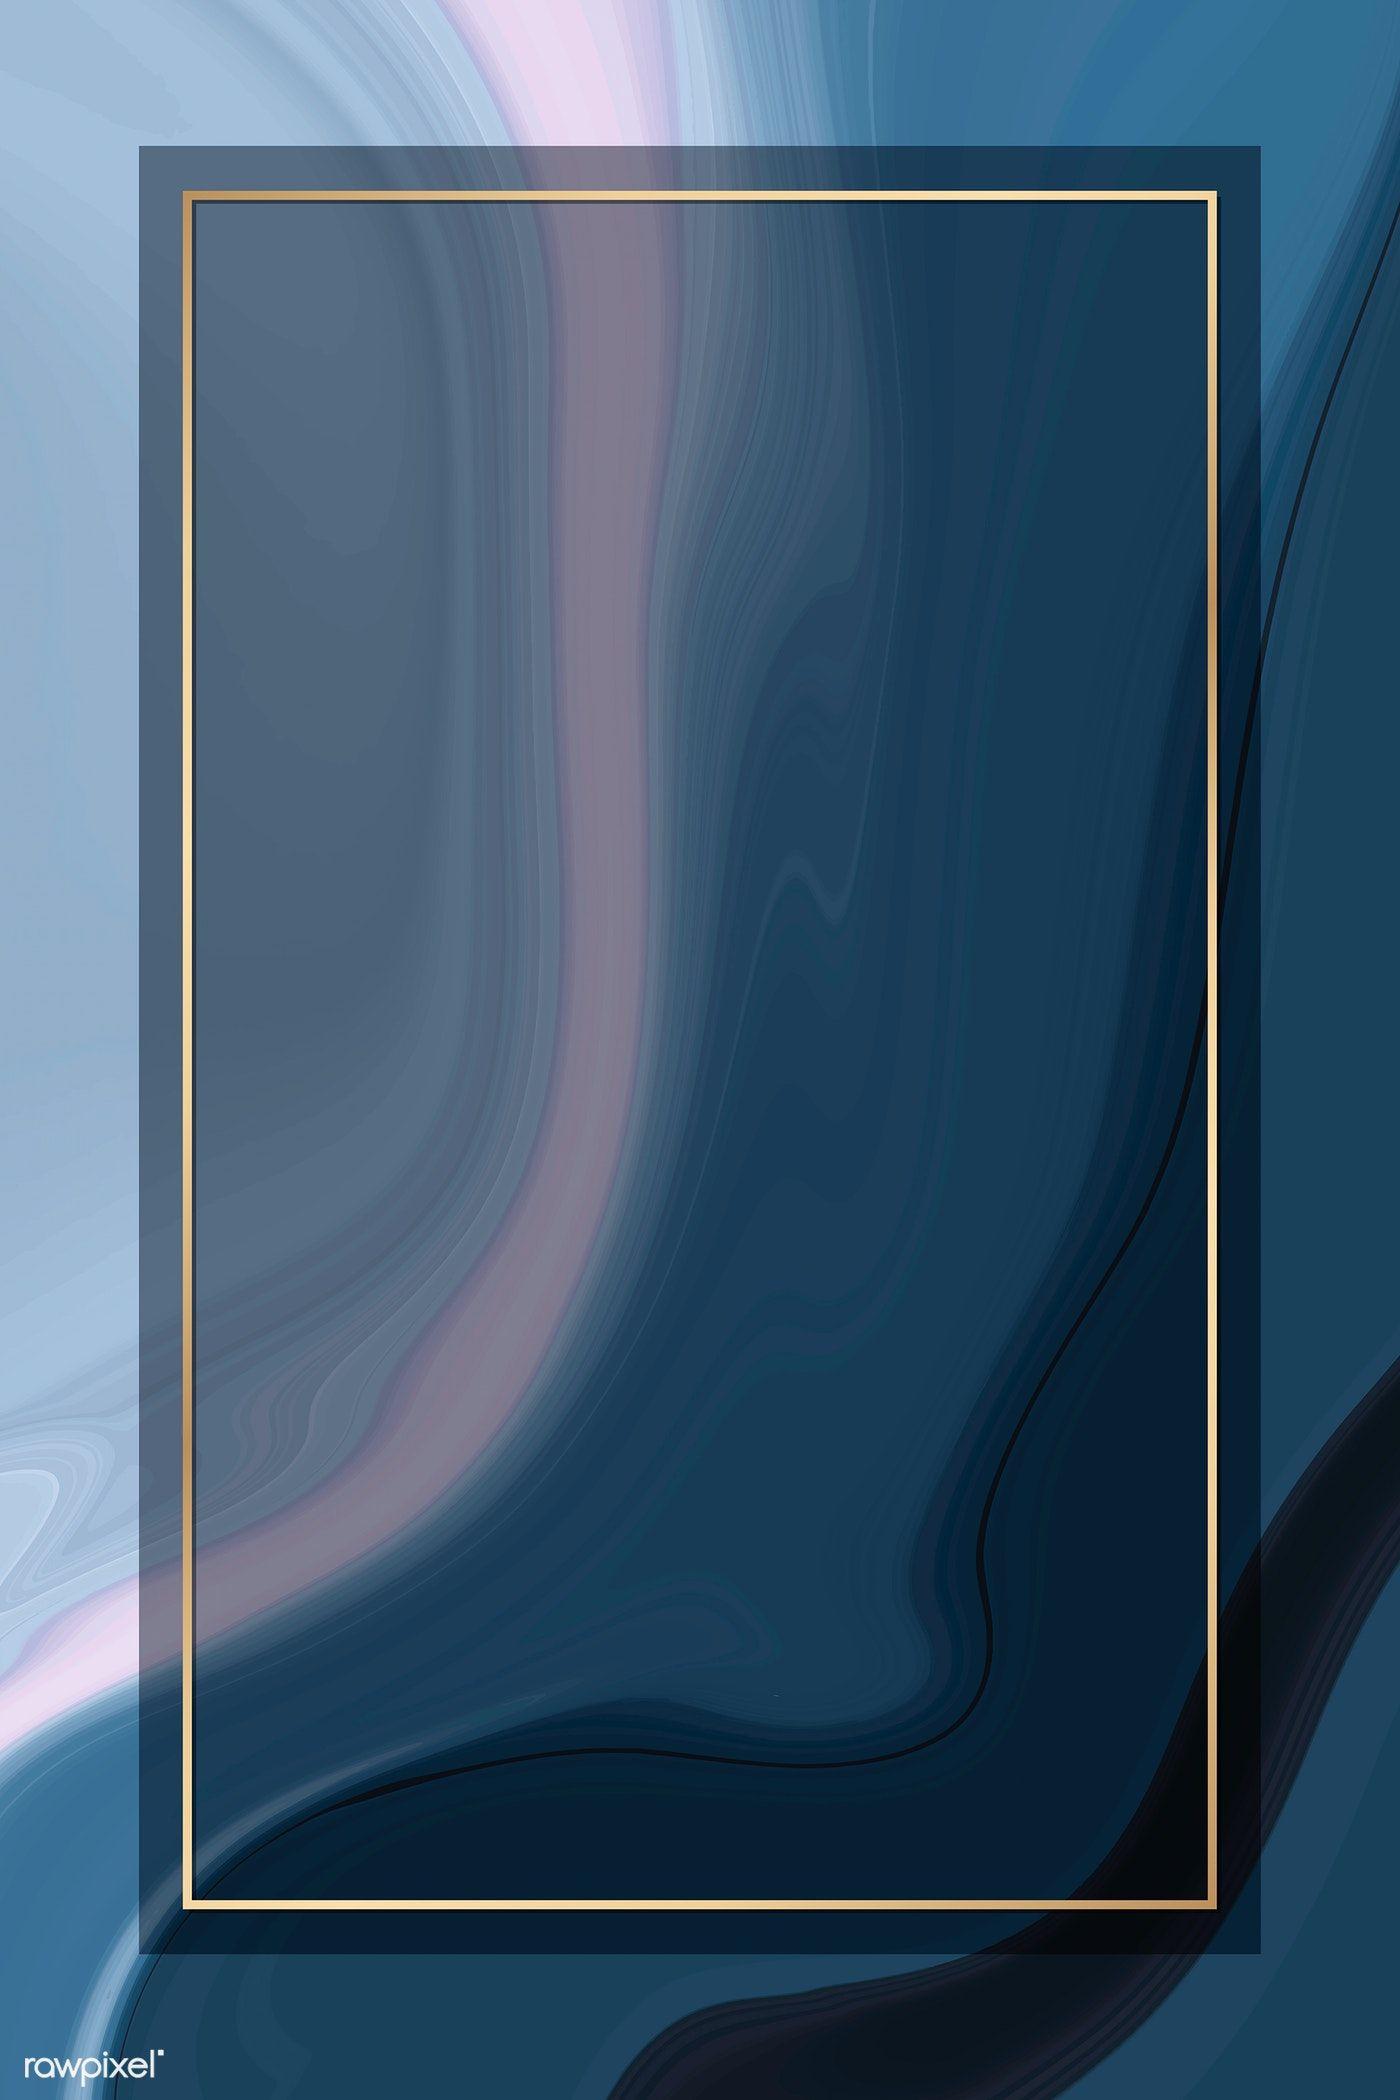 Download premium vector of Pink gold frame on blue fluid